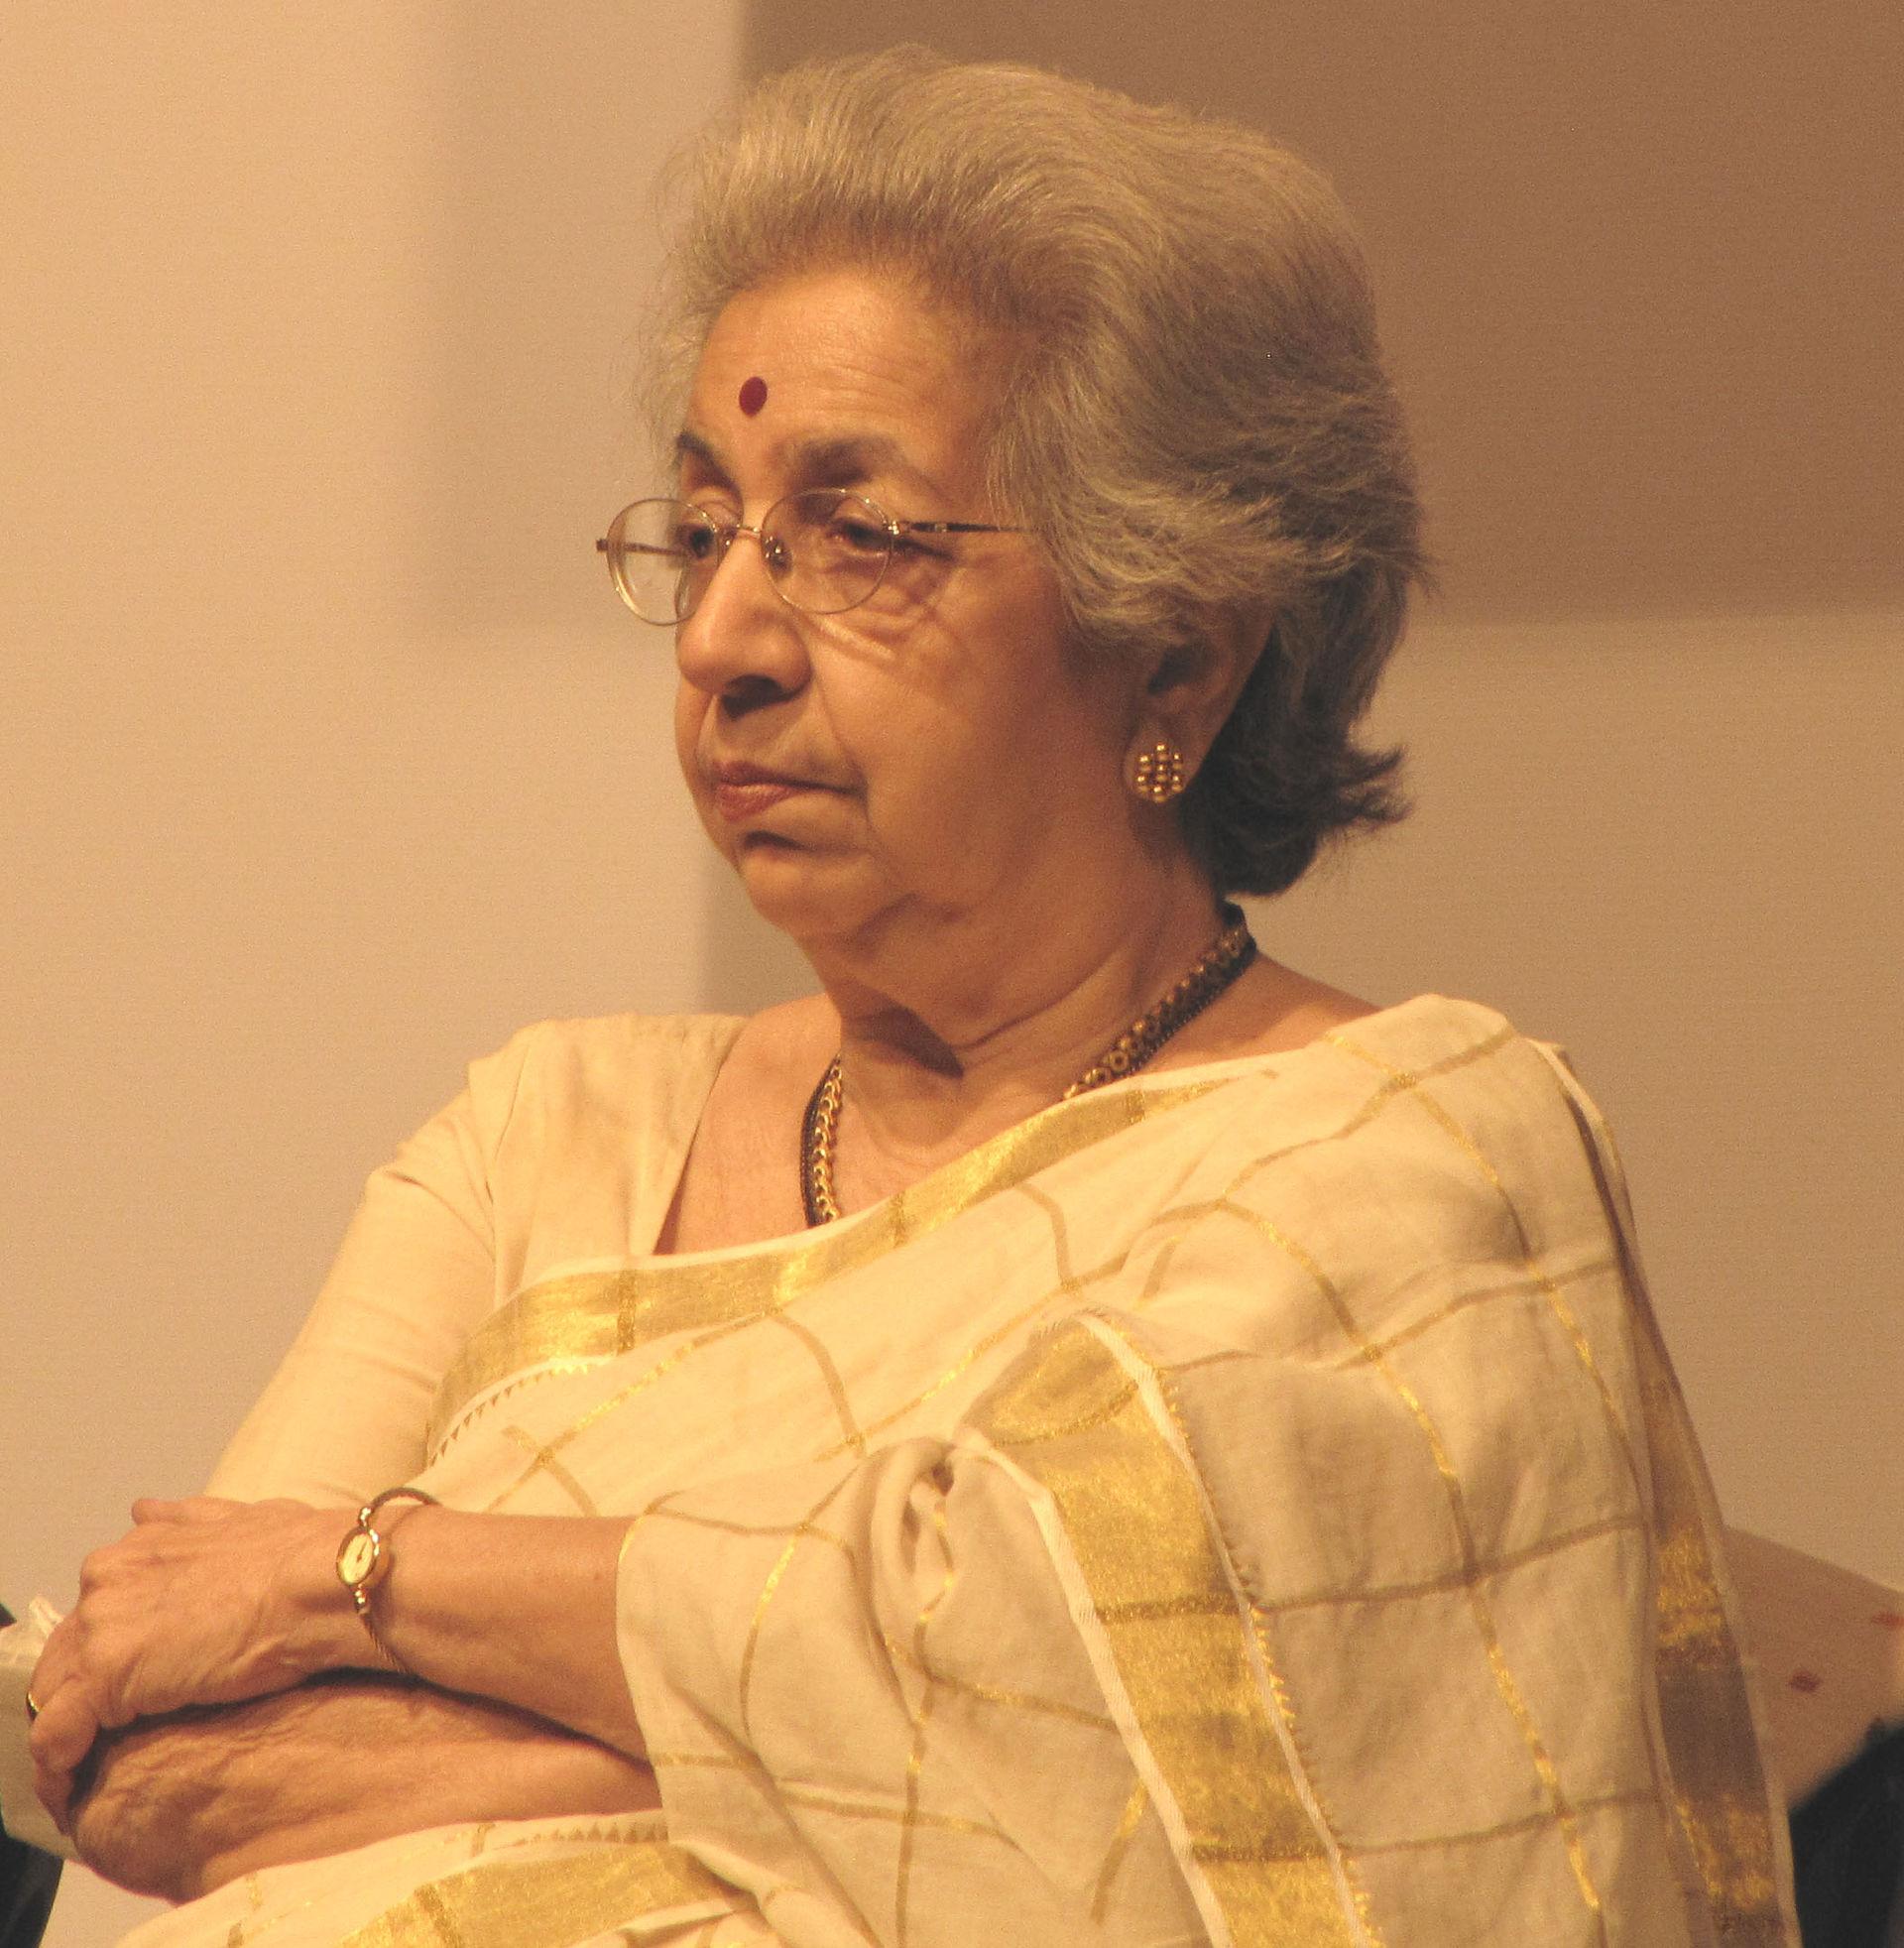 Vijaya mehta wikipedia for K murali mohan rao director wikipedia